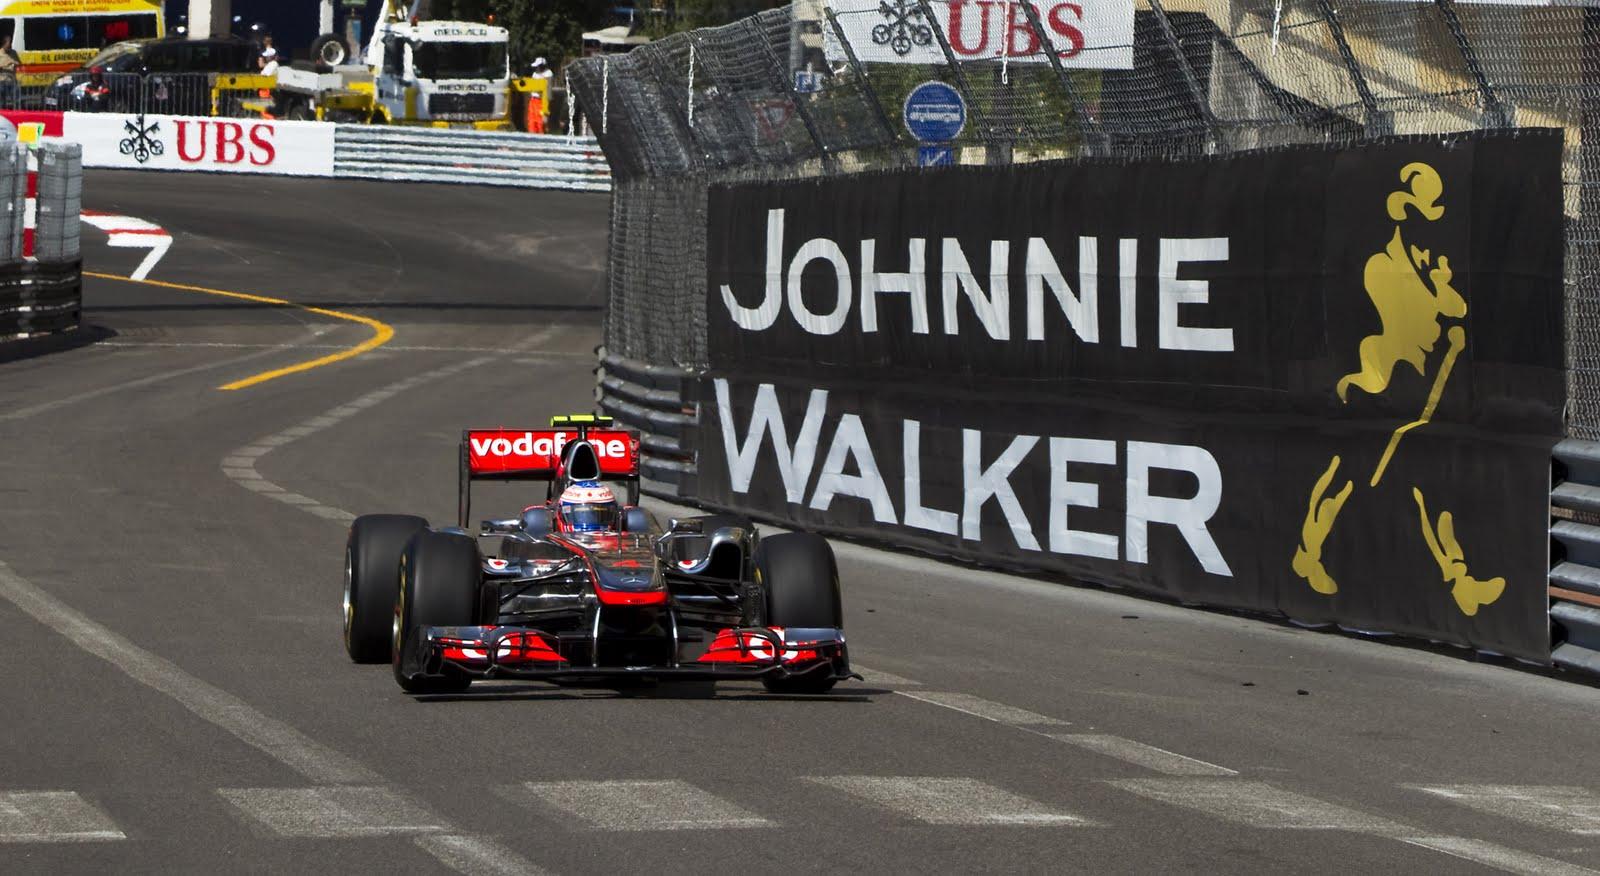 JOHNNIE WALKER FORMULA 1